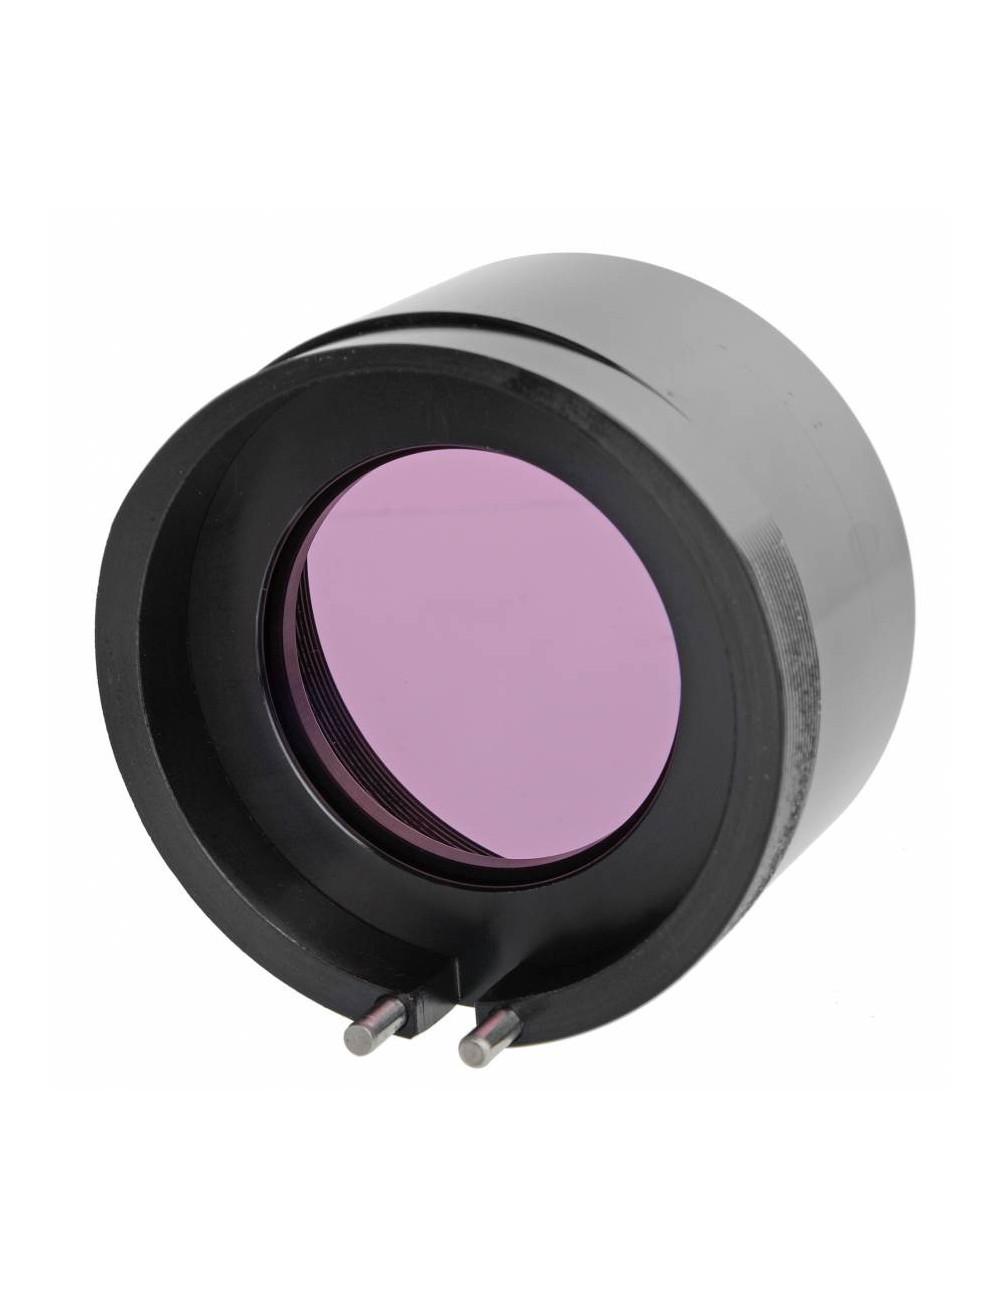 Filtre anti-reflexion pour Lunt LS80THa/DSII